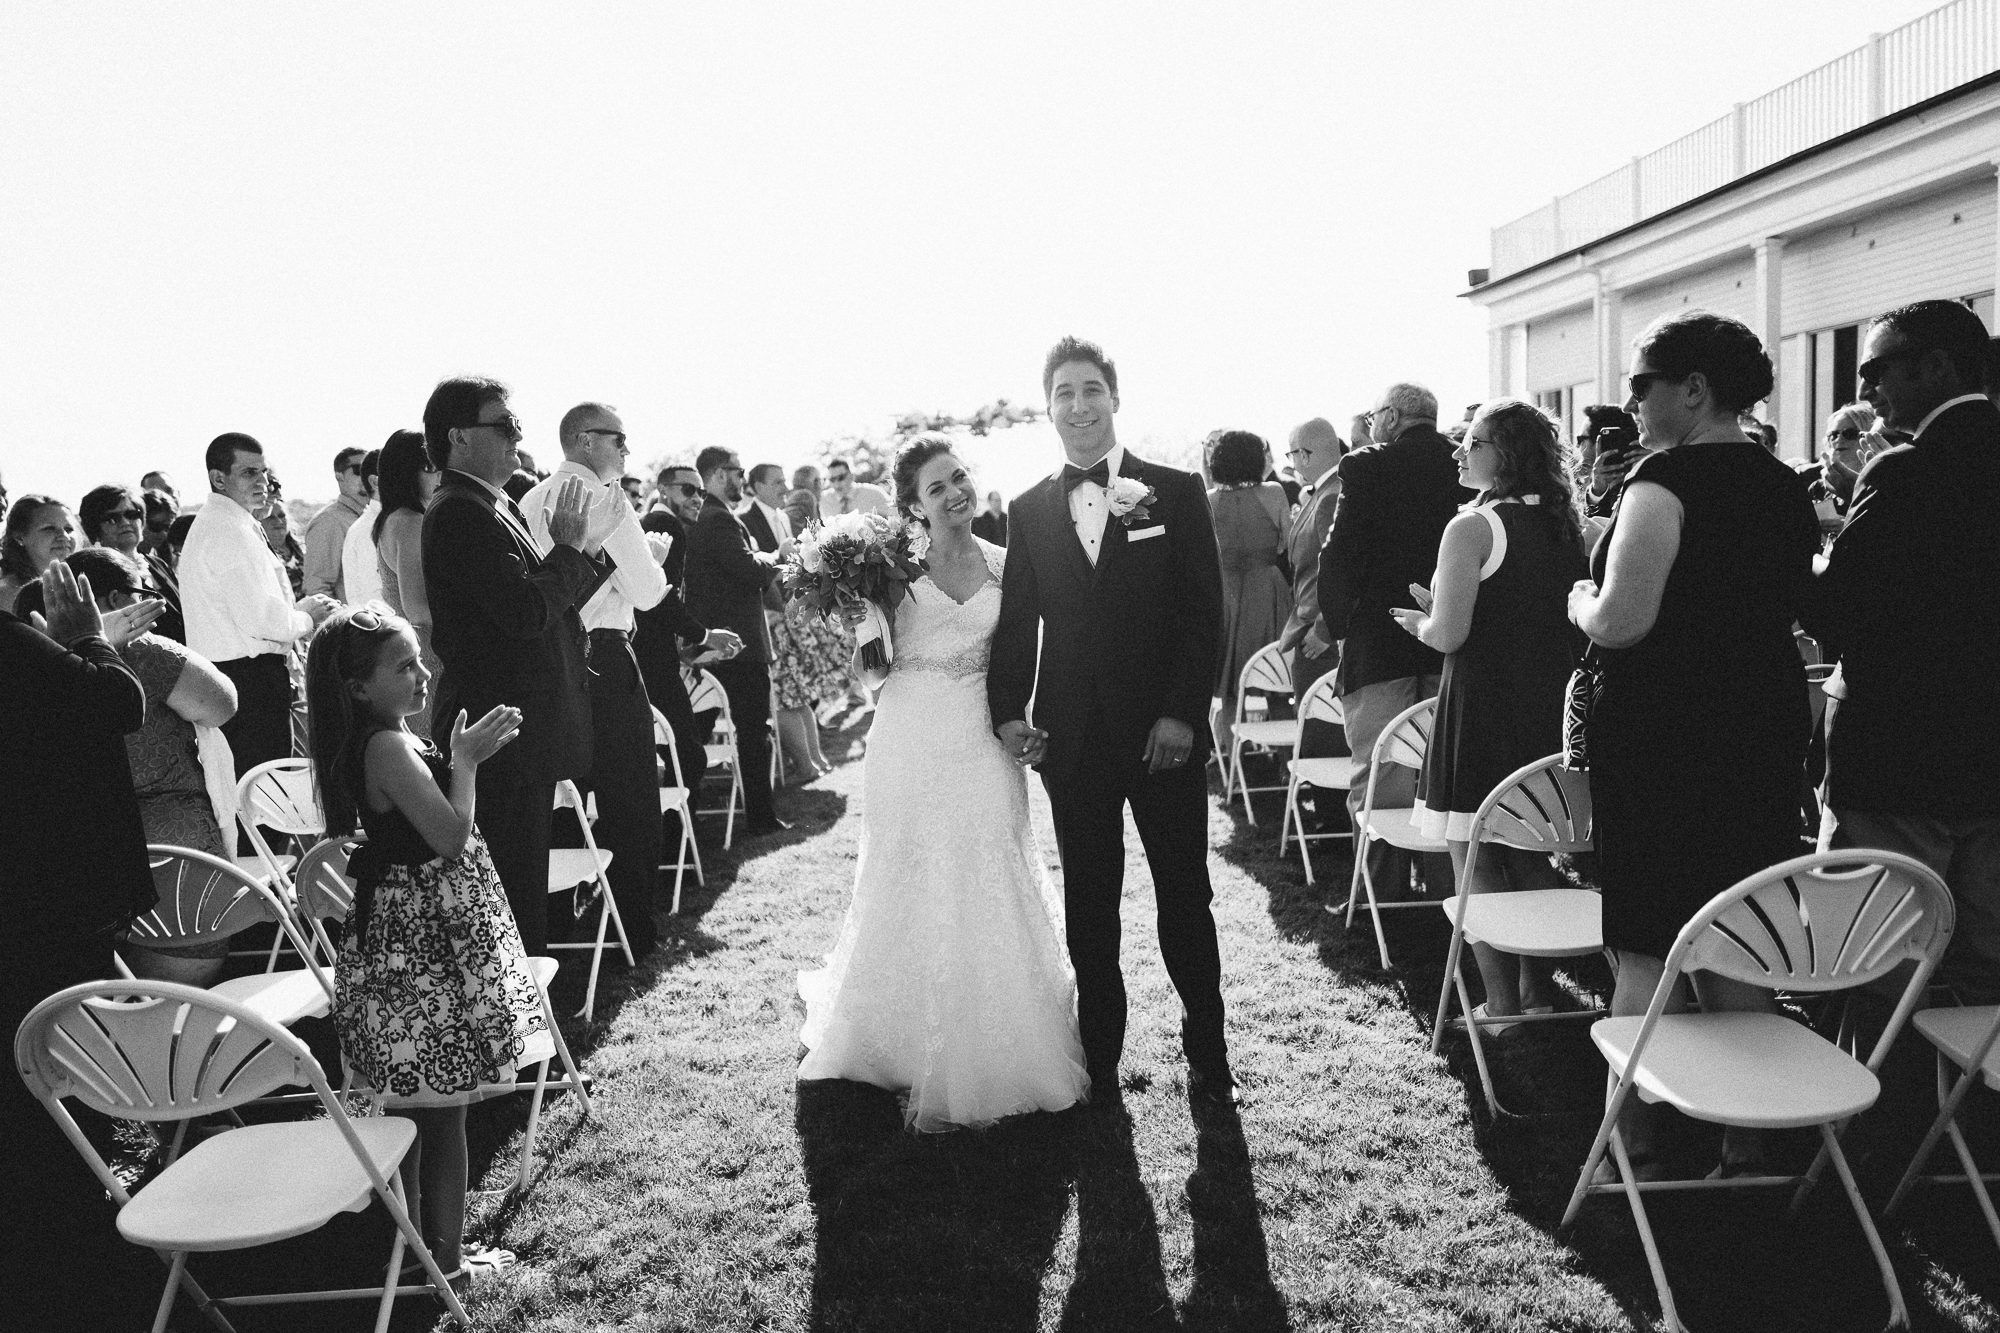 scranton-wedding-photography-zak-zavada-2016.06-rebeccaIan-0495.jpg